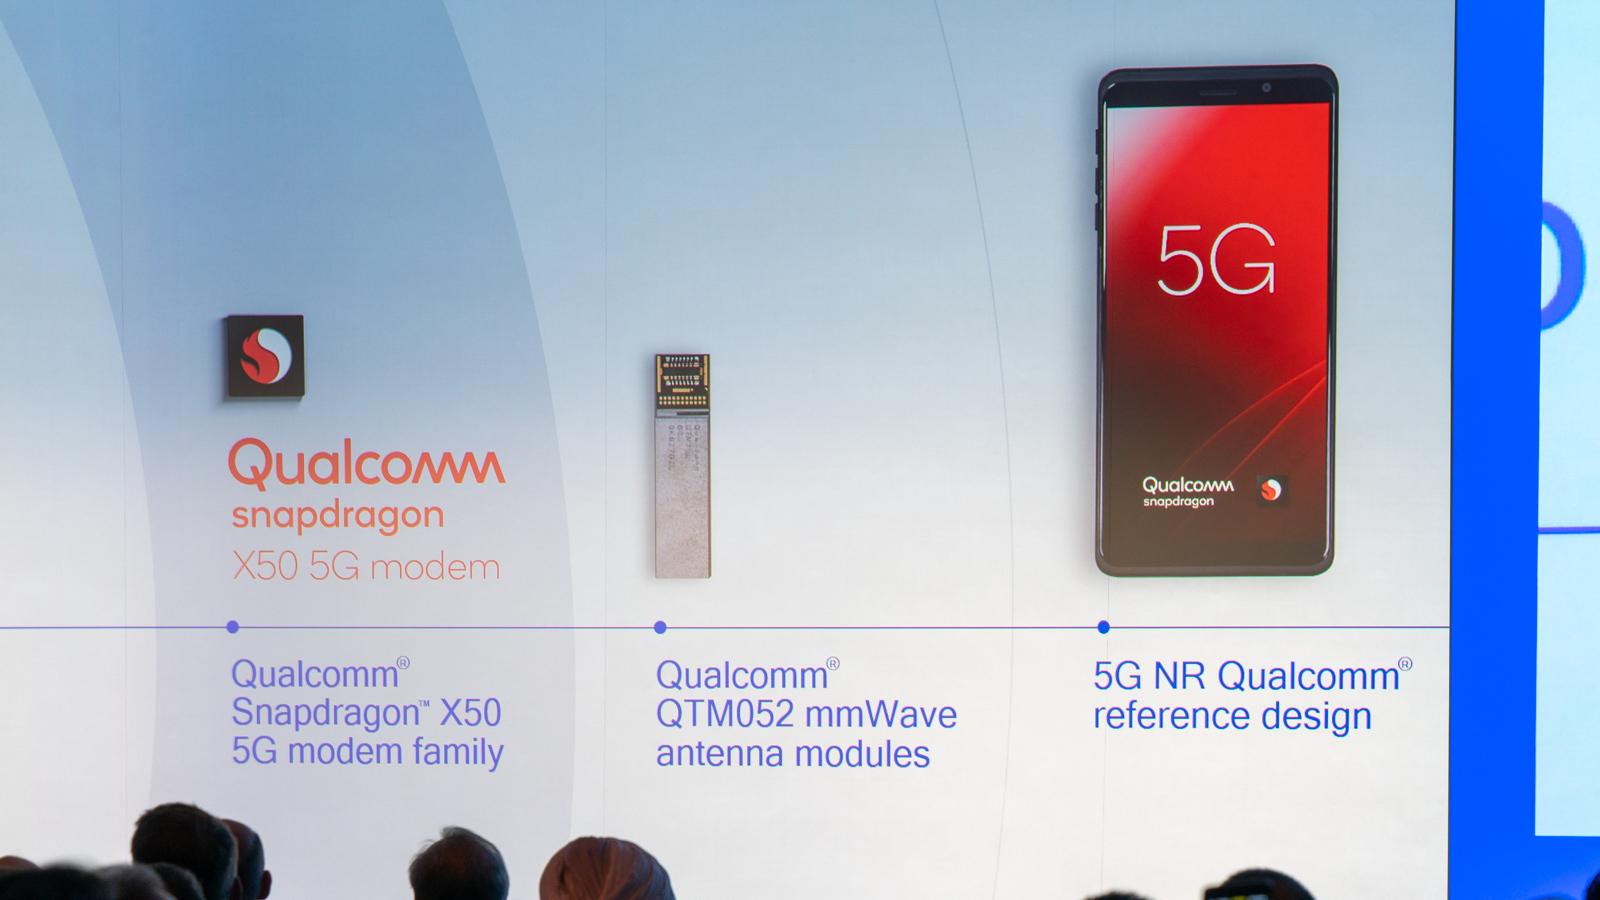 5G 时代的高通,想要覆盖 1000 亿美元的广阔市场